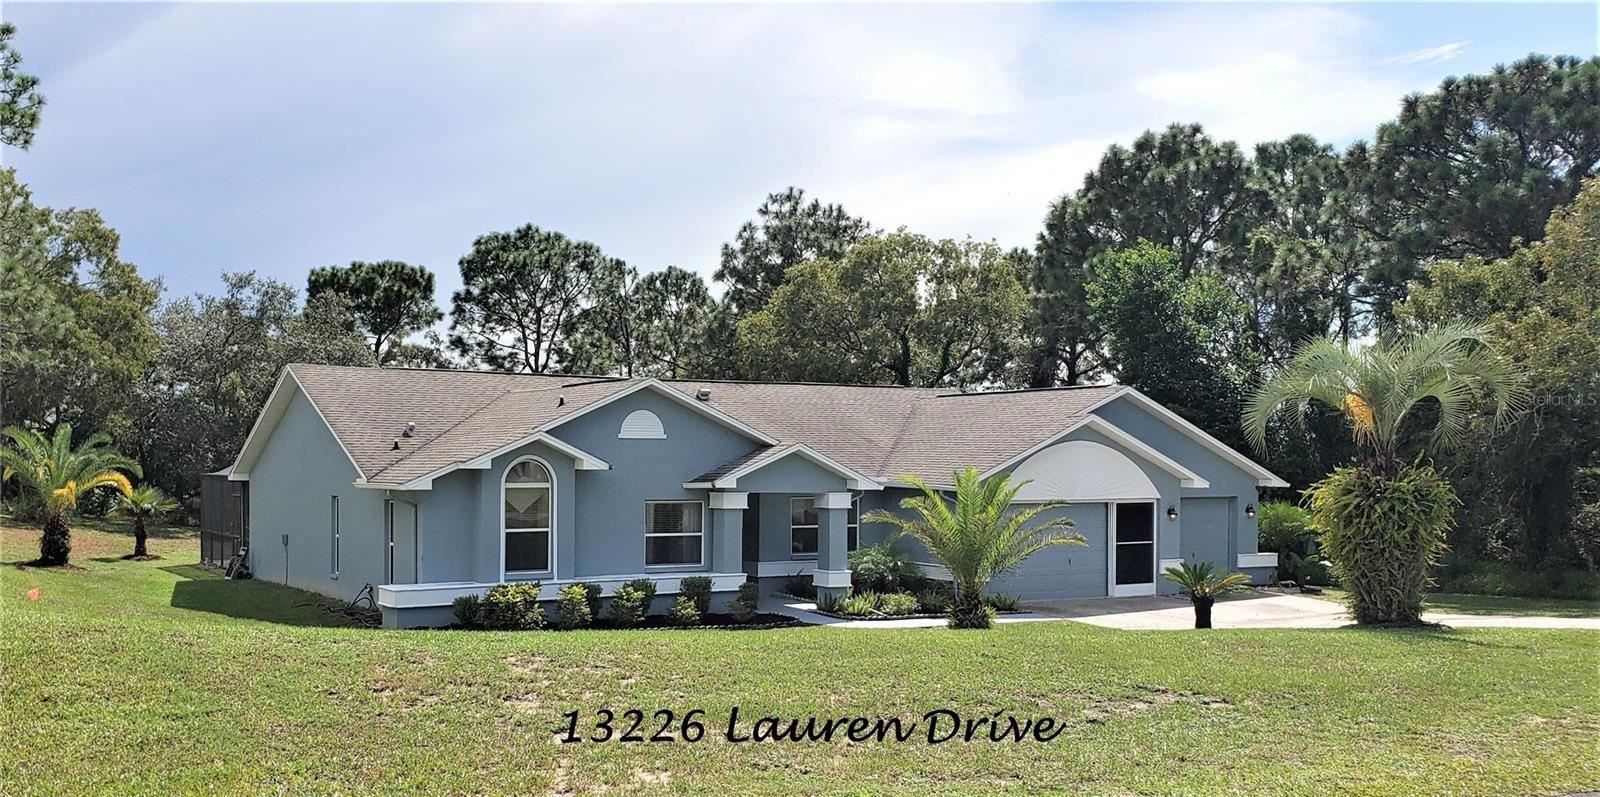 13226 LAUREN DRIVE, Spring Hill, FL 34609 - #: U8136408